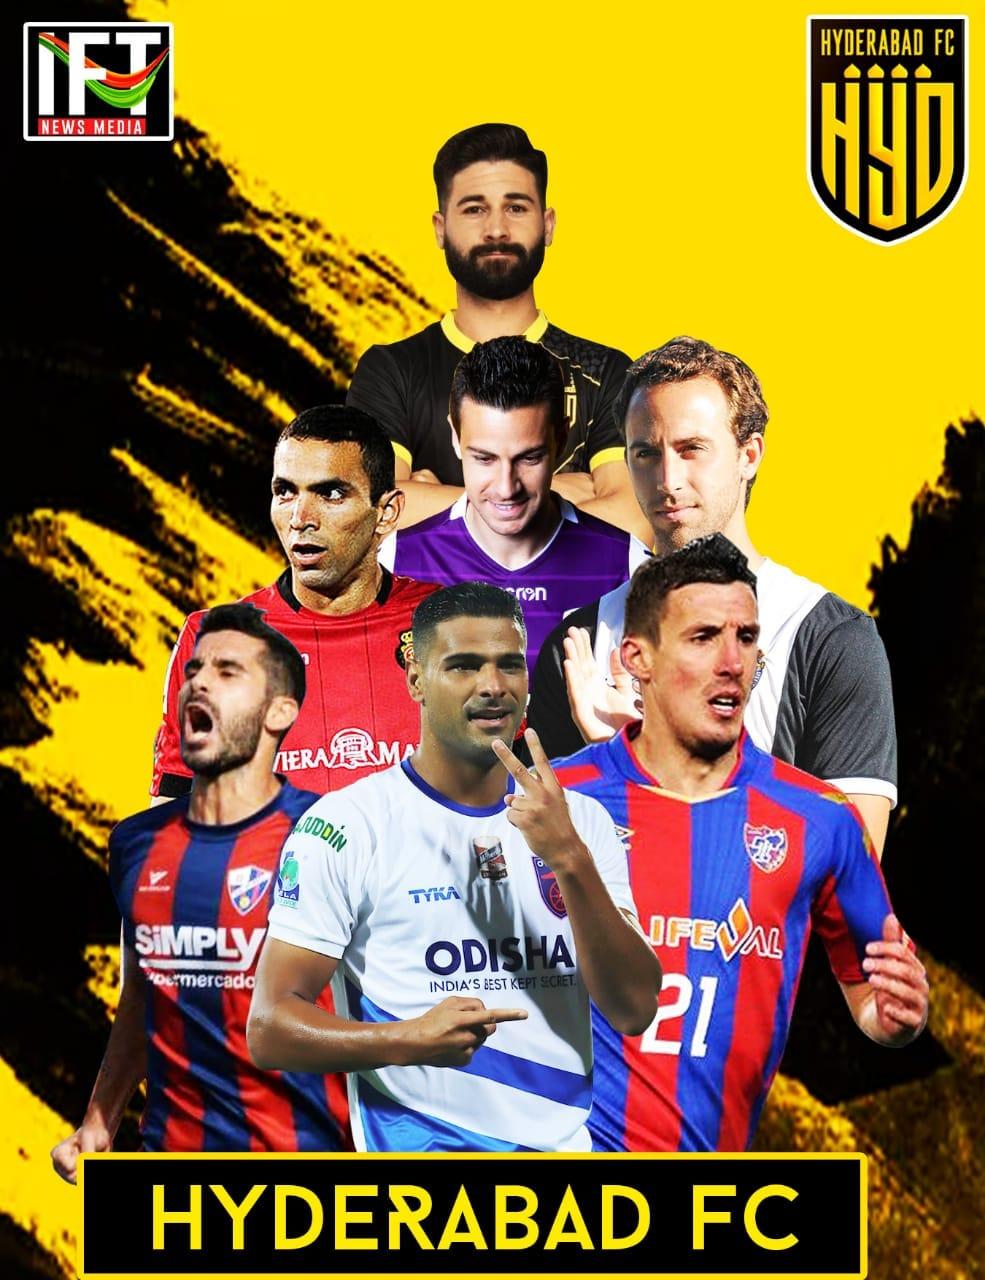 Who are the foreign recruits of Hyderabad FC for 2020-21 season? YT8q0FIFIYC9wZsw O5uZtDkiNVxvJlCy2C4DLfOjGGQvvJhB2Z8gWbstkBxxavogZwPWSylaiaIOpCobRkWrtSm8ePCWKFF8hdaUDd329szbQ FEG5bCEQ6lD2IAB uSVV7jhVI